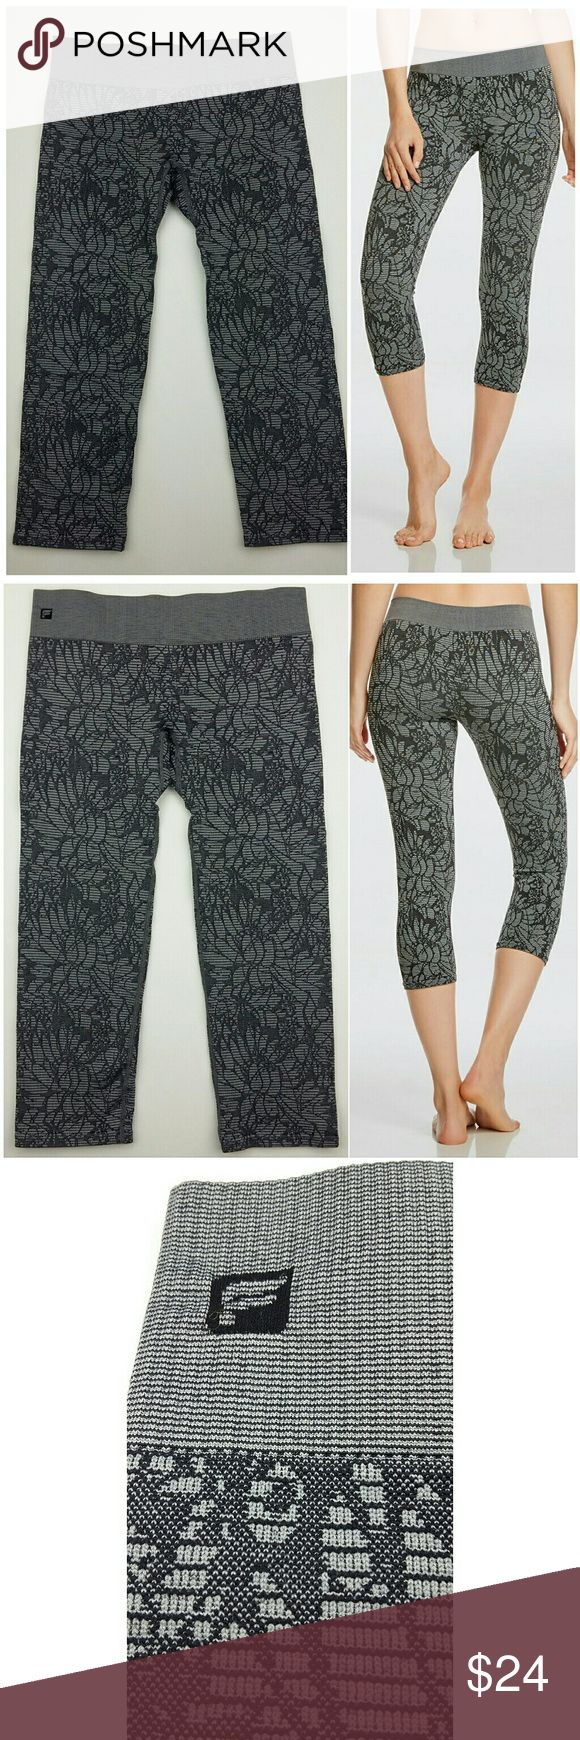 "FABLETICS Sebastian seamless leggings floral S EUC, no stains, no rips, no holes, no piling, floral jacquard, 12"" waist, 6"" rise, 18"" inseam. Fabletics Pants Leggings"